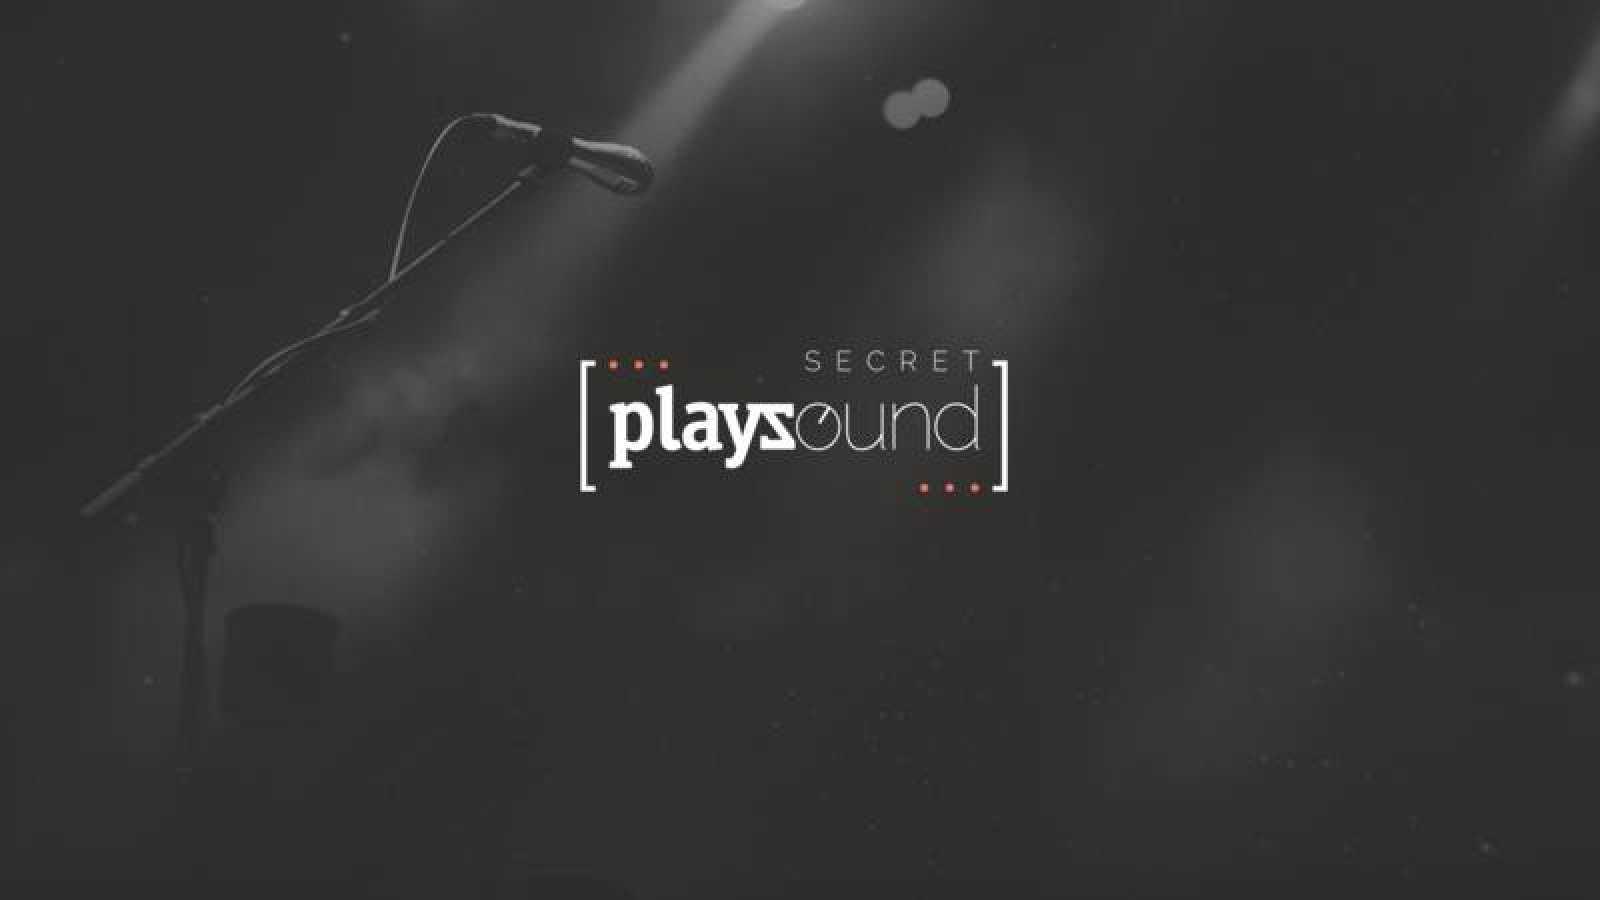 Secret PlayZound